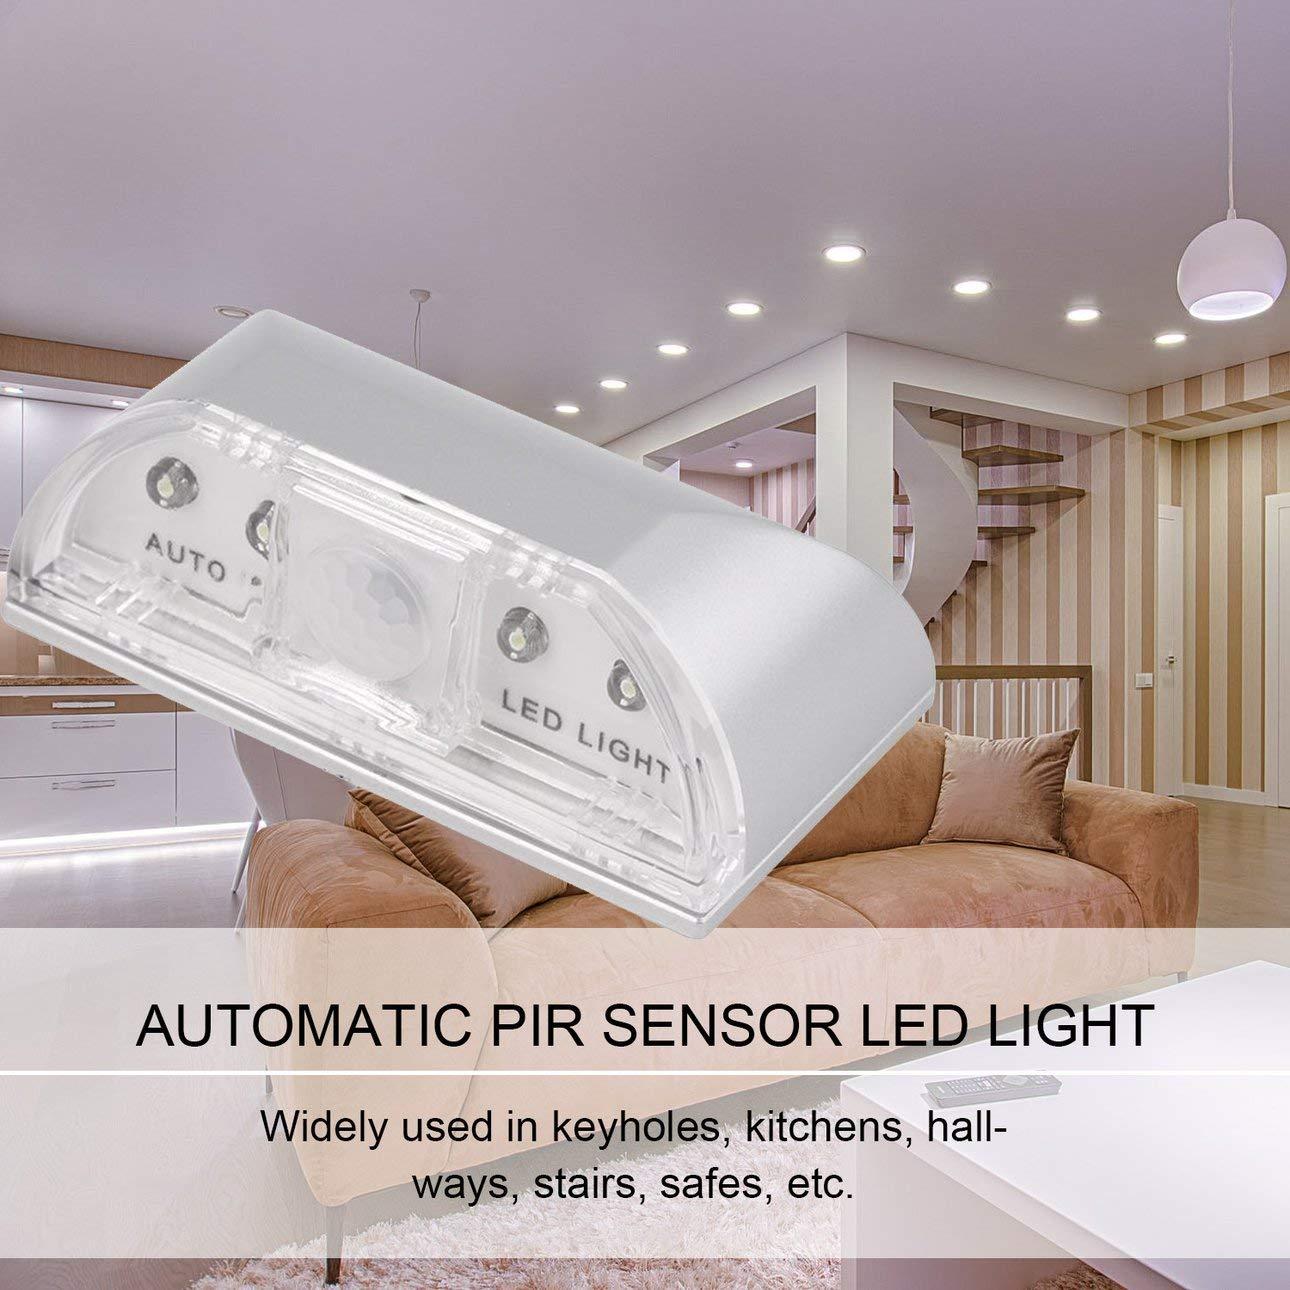 bater/ía AA 4 LED L/ámpara de Movimiento de Sensor LED Luz Nocturna Celerhuak Detector de Sensor de Movimiento de Ojo de Cerradura de Puerta PIR autom/ático L/ámpara de luz LED Plateada para 1